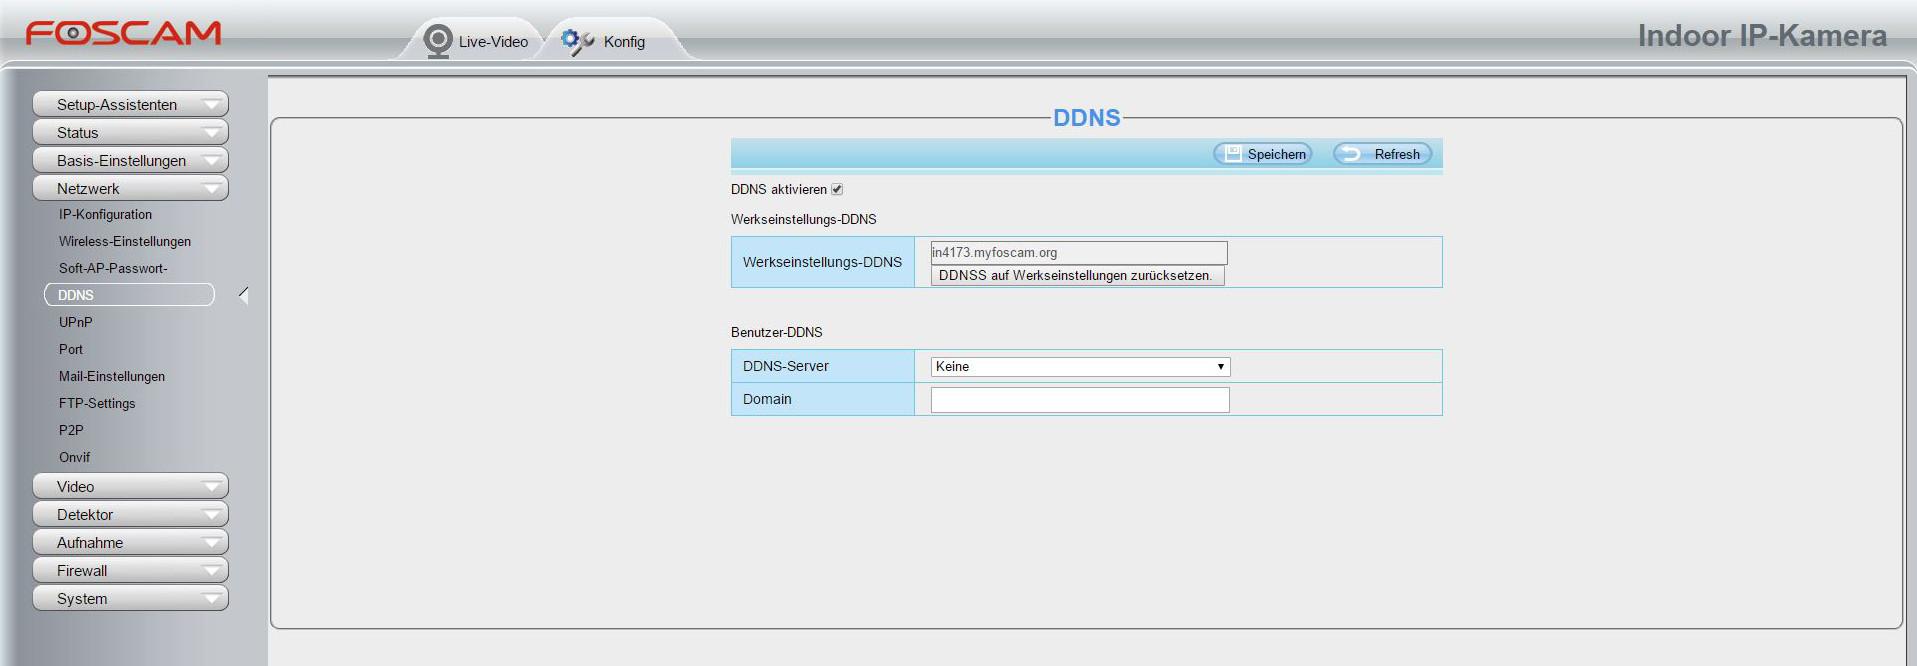 Foscam Alarmeinstellung DDNS